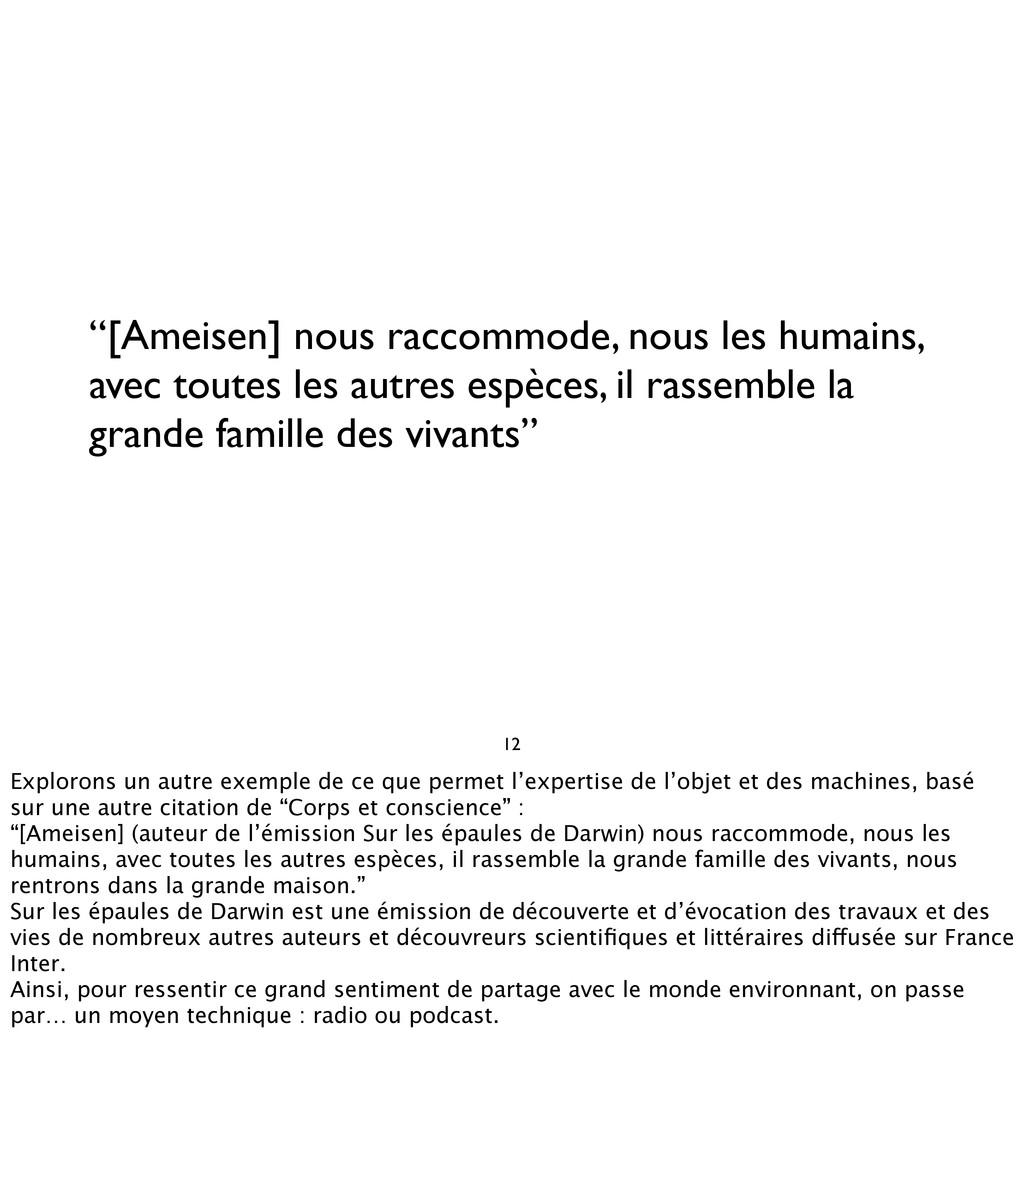 """[Ameisen] nous raccommode, nous les humains, a..."